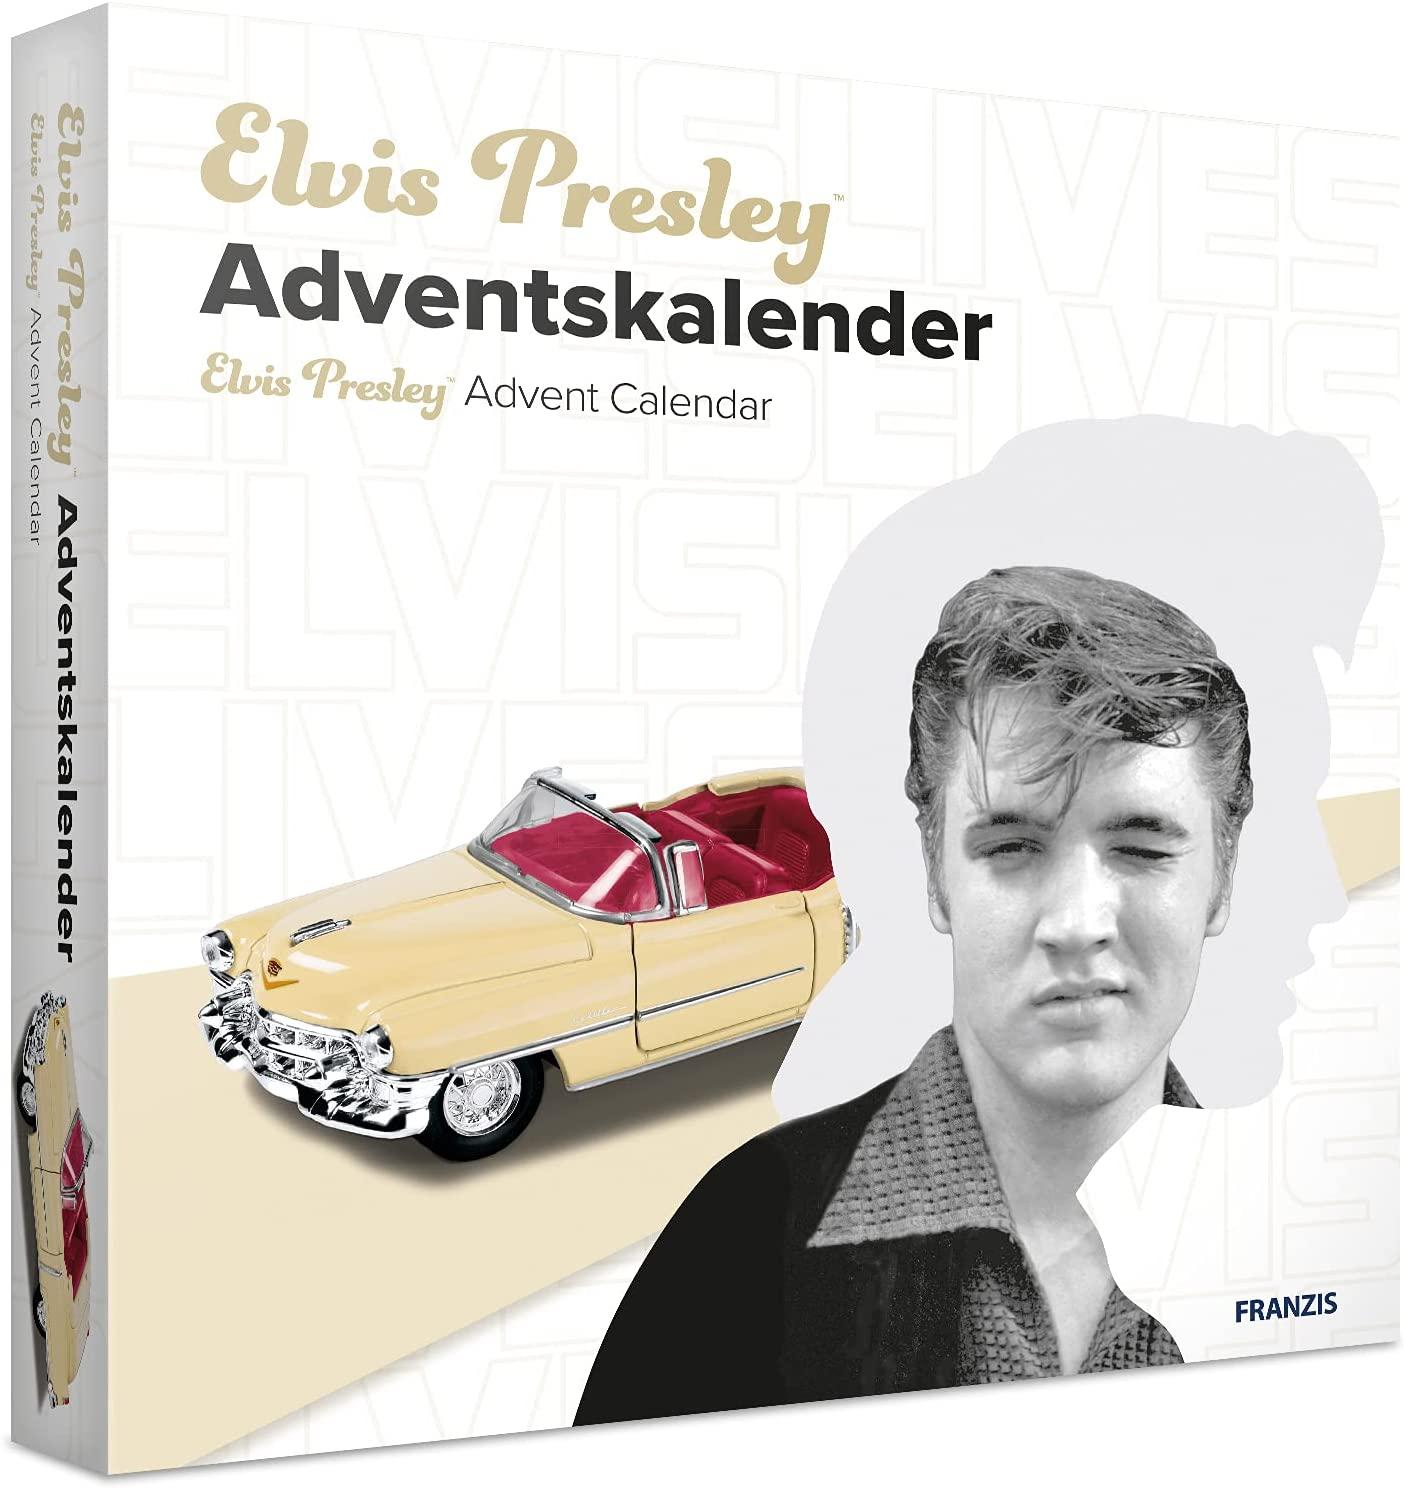 FRANZIS Elvis Presley Adventskalender